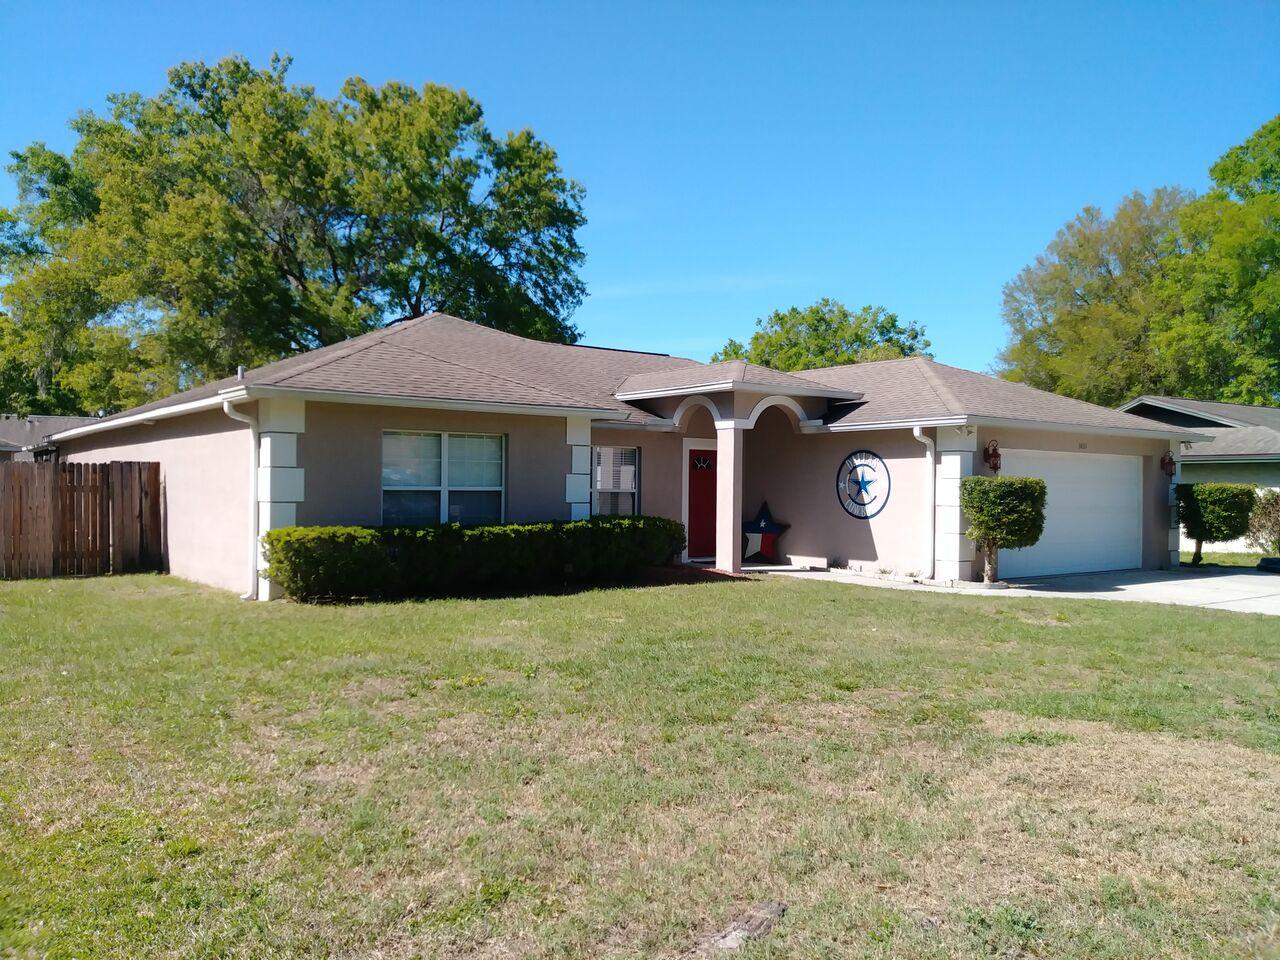 Photo of 3633 Greatwood Ct, Land O' Lakes, FL, 34639